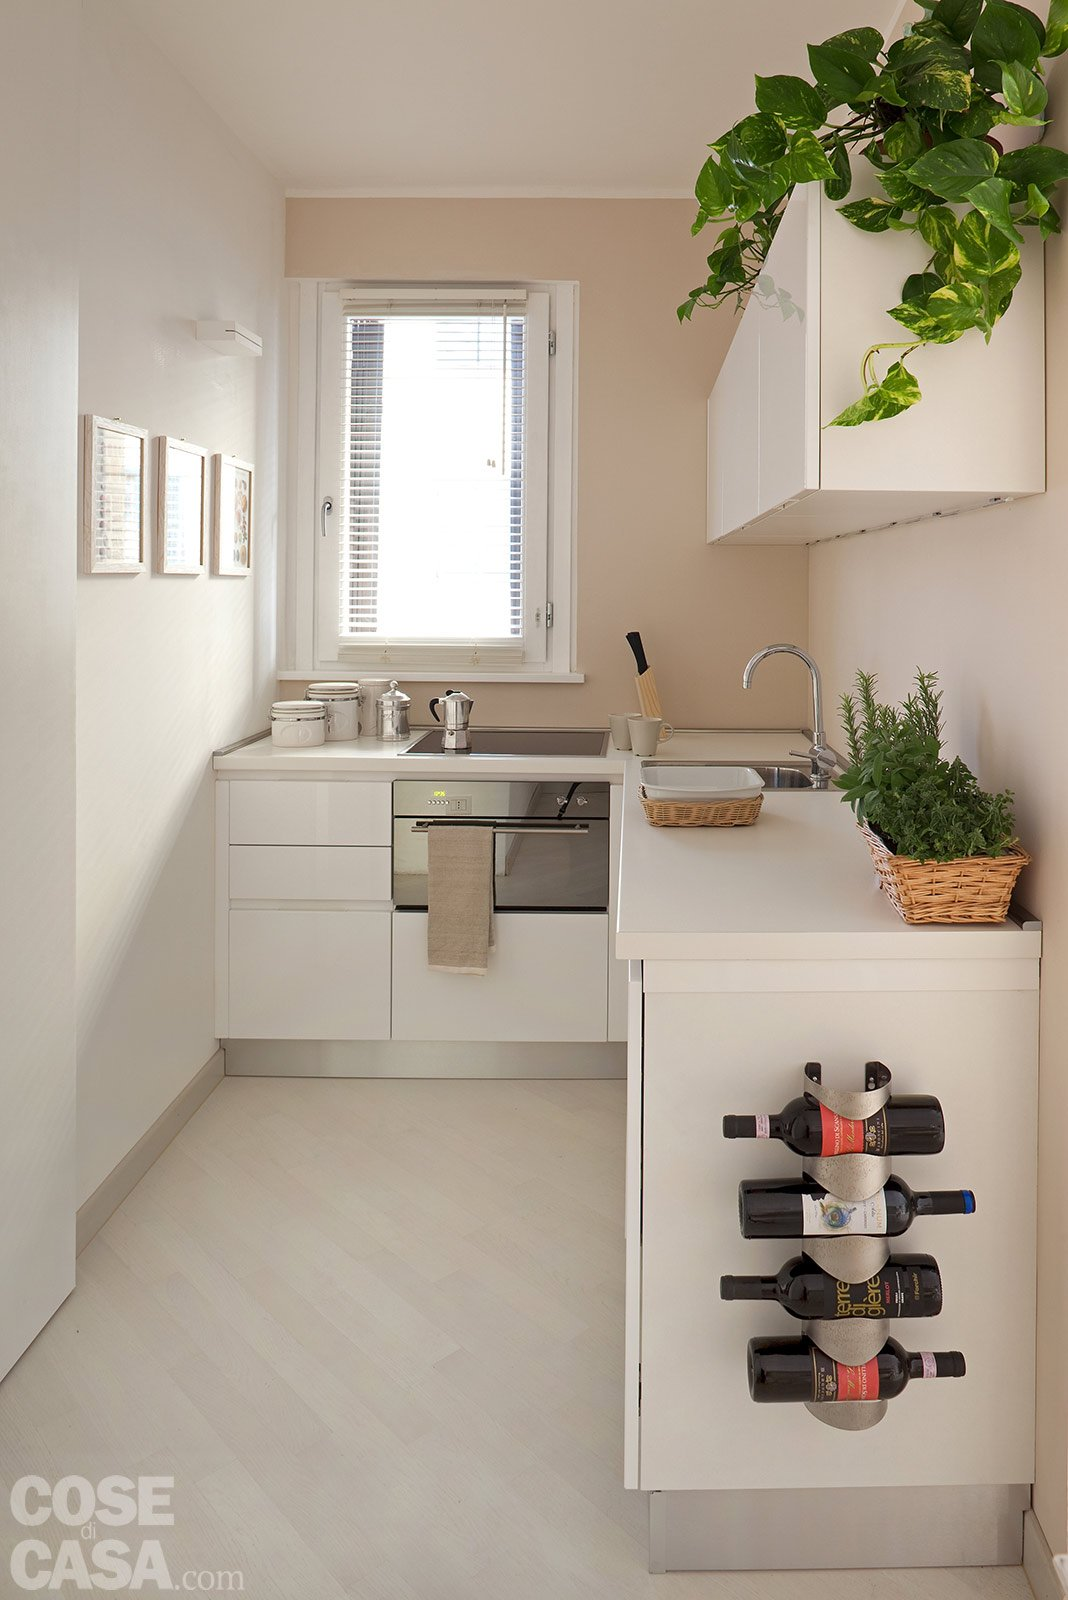 44 mq una stanza in pi in casa cose di casa for Arredare cucina piccola e stretta